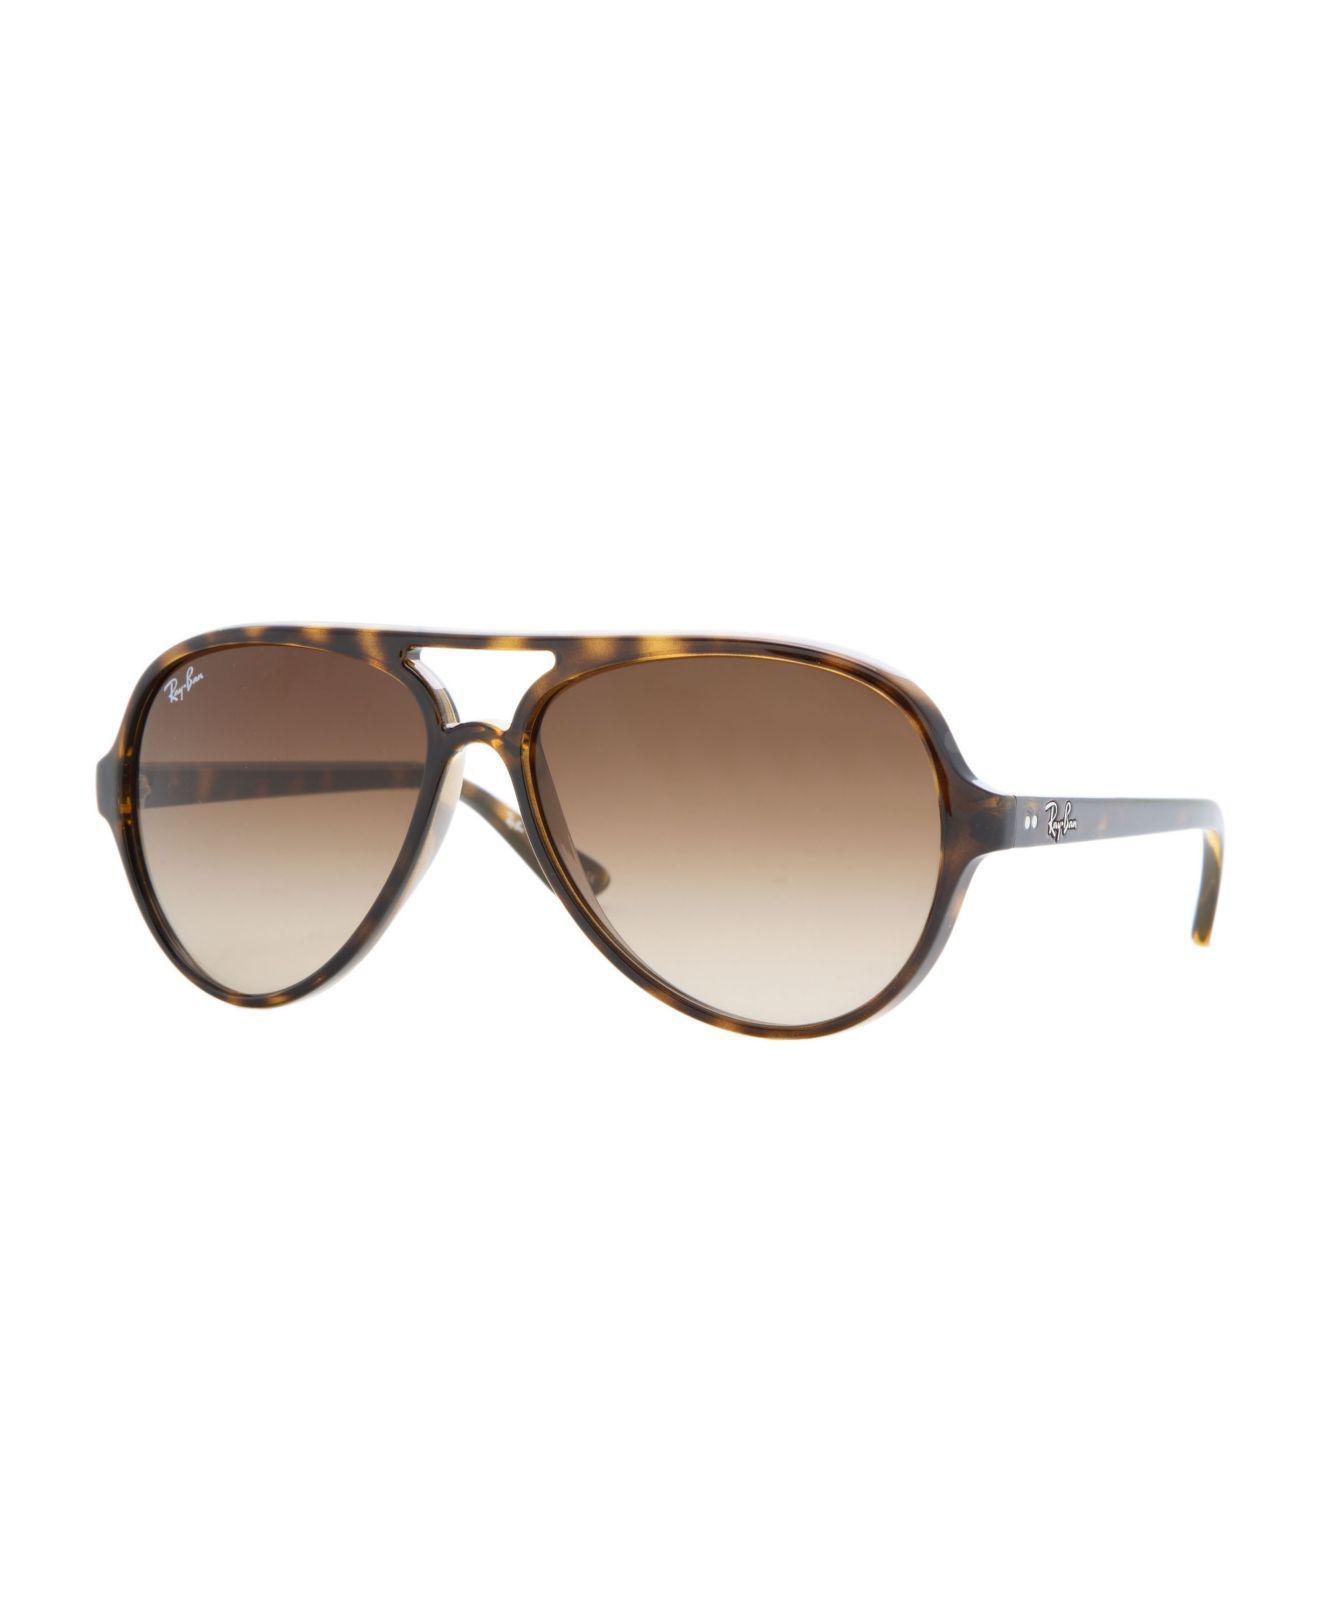 8945bd60f2a9f ... erika polarized sunglasses e2be7 4e7e0 australia ray ban women s brown  sunglasses a1089 6c143 ...